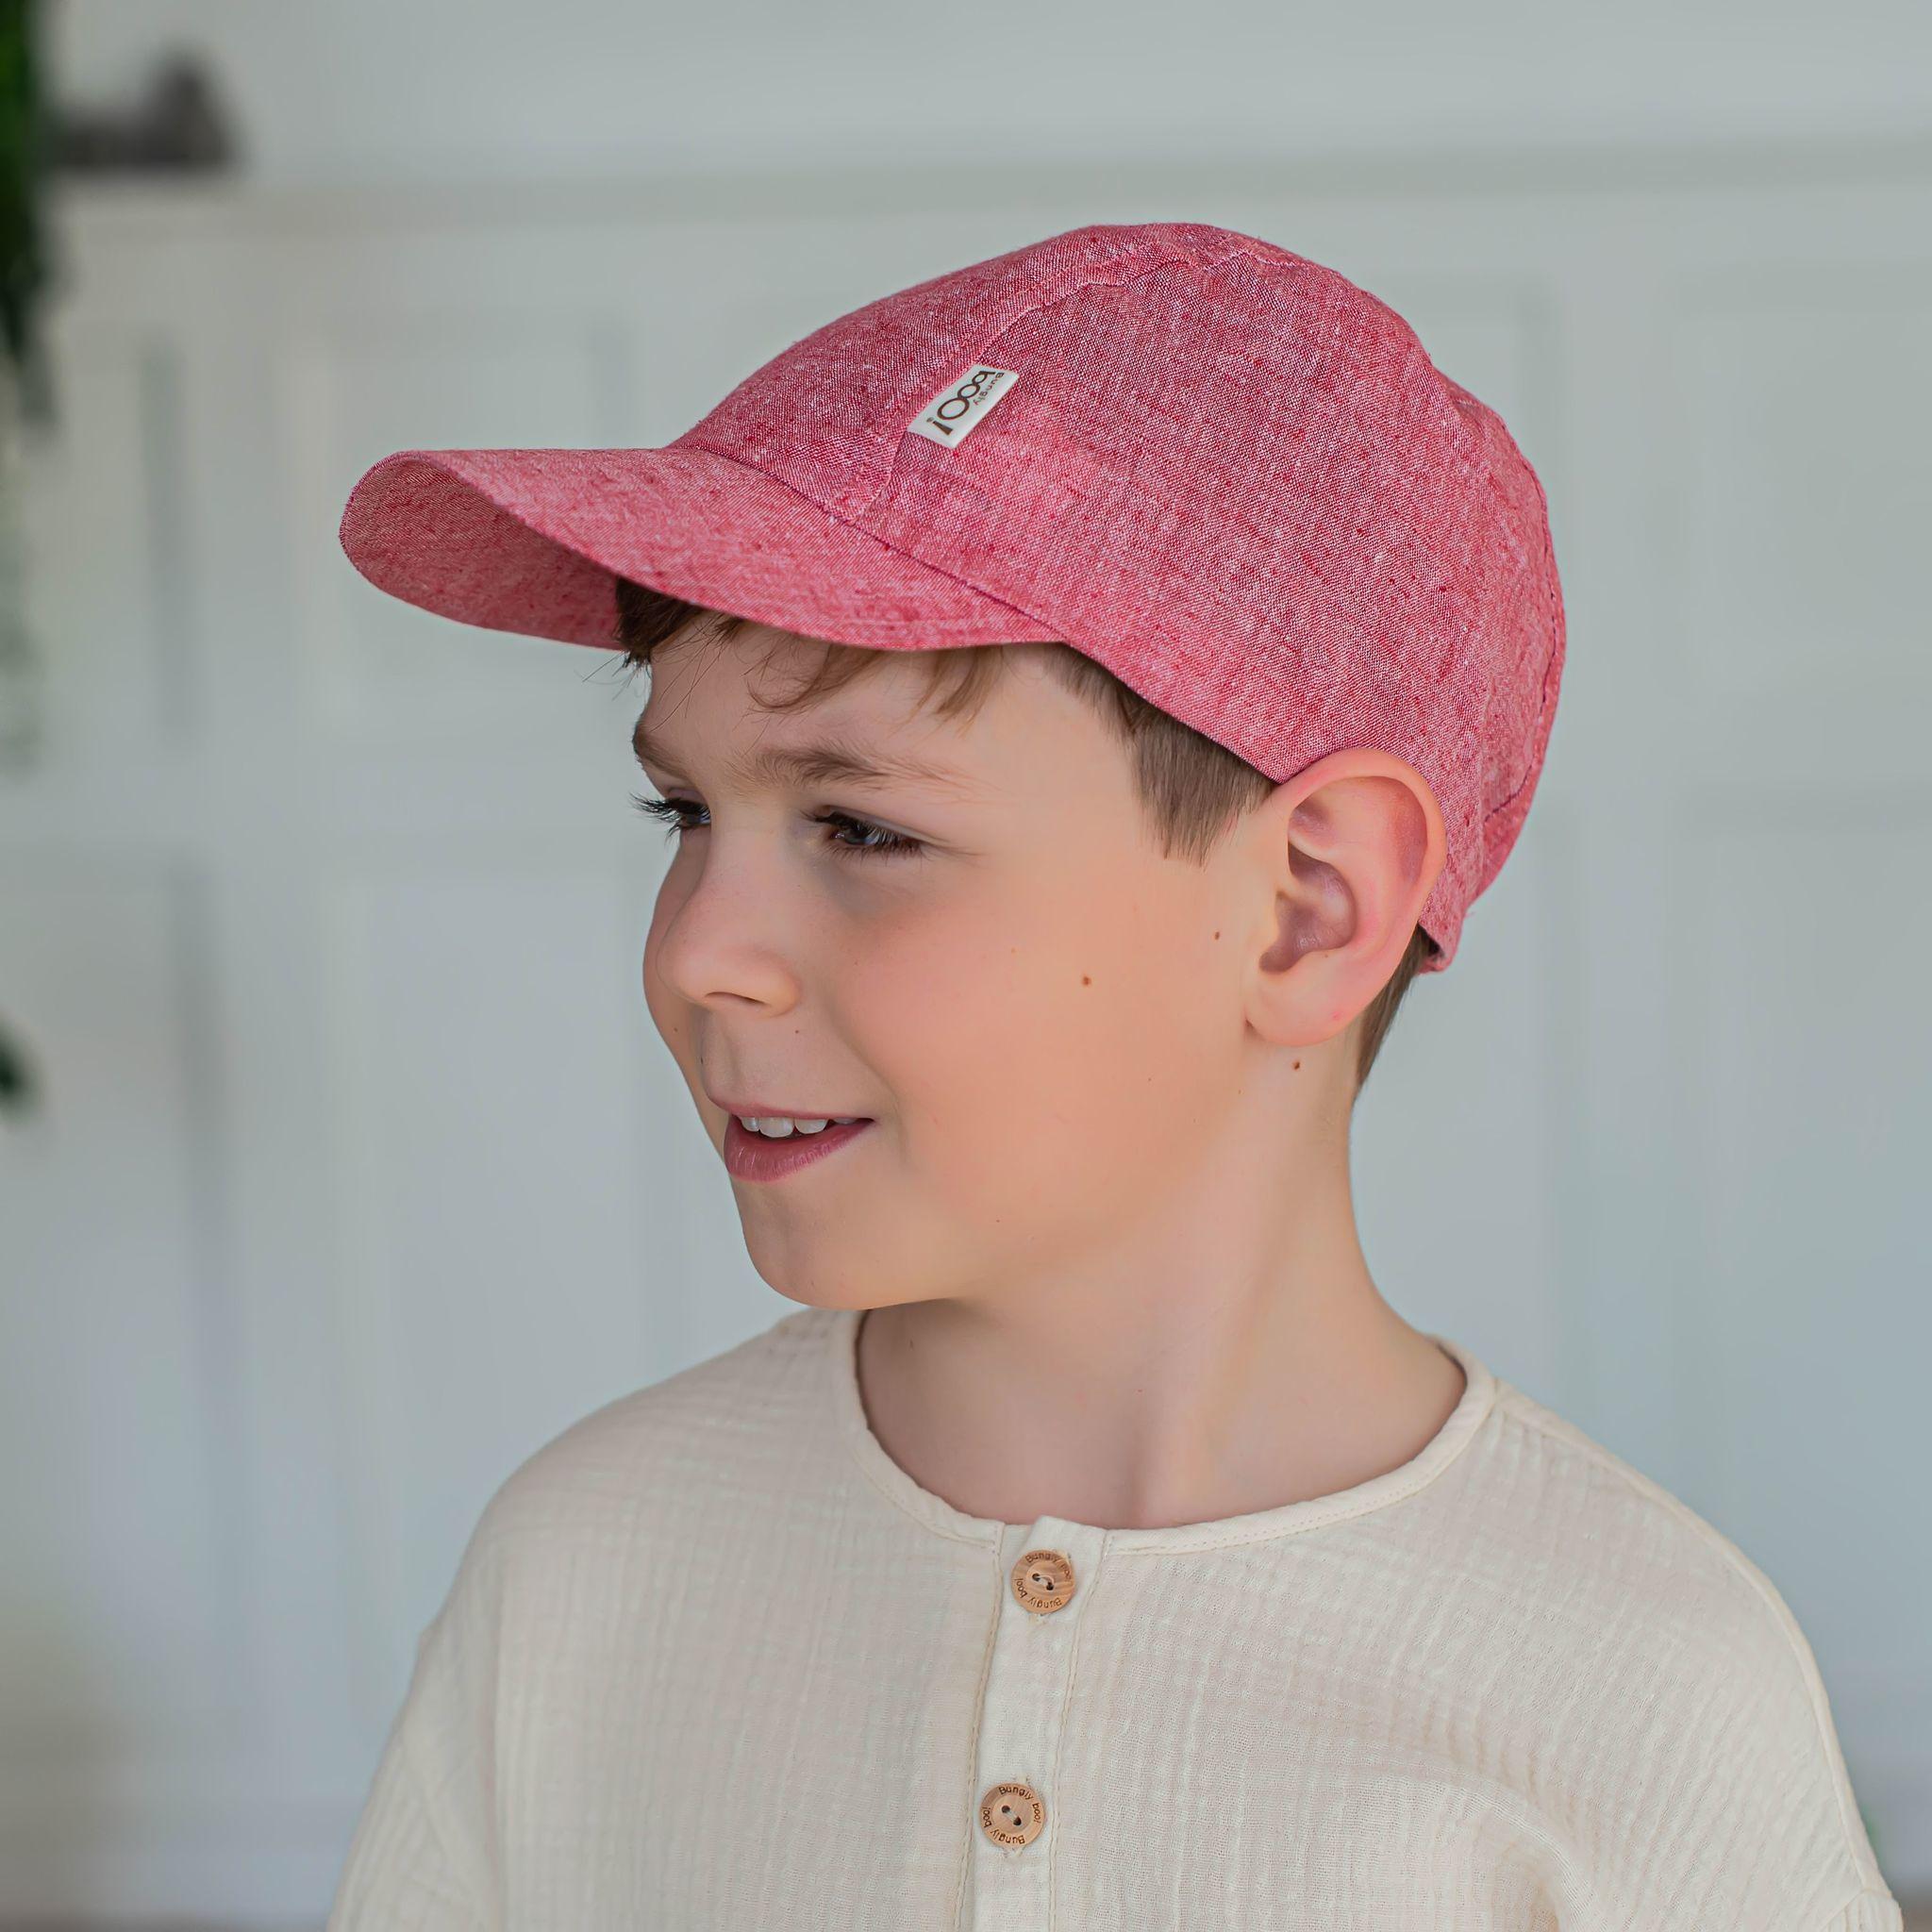 Cotton cap for teens - Deep Red Melange